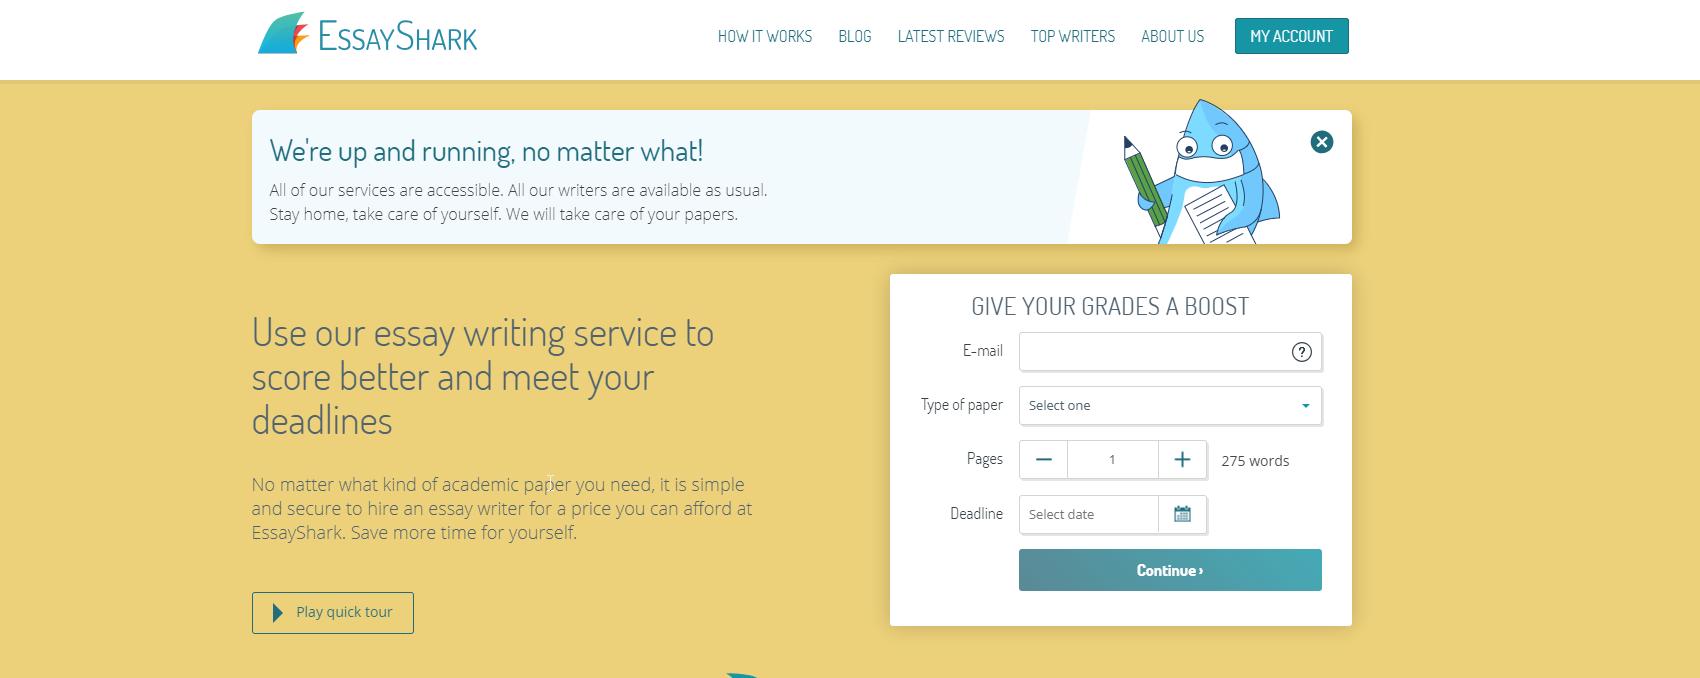 essayshark-homepage